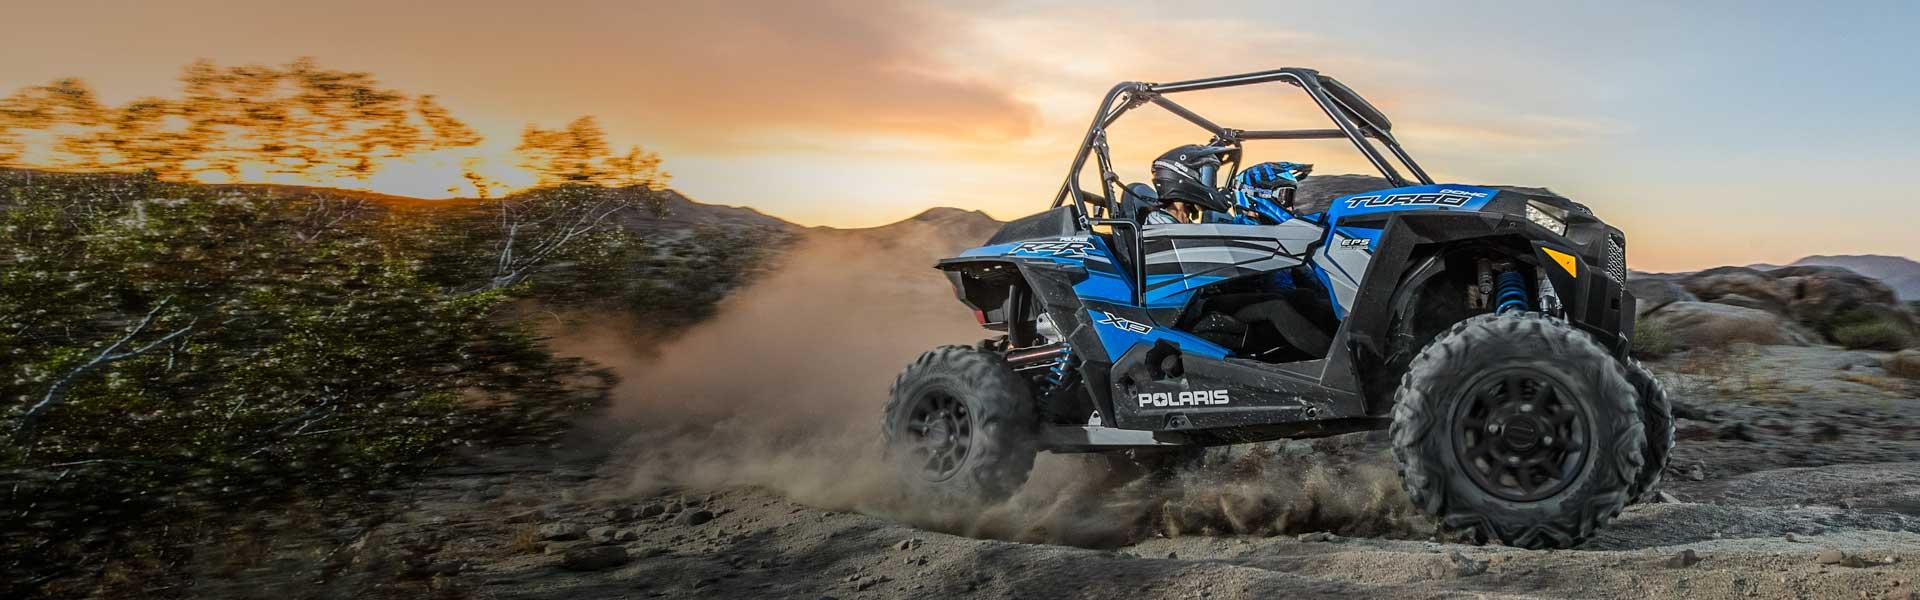 Polaris New Zealand:Rzr XP® Turbo EPS